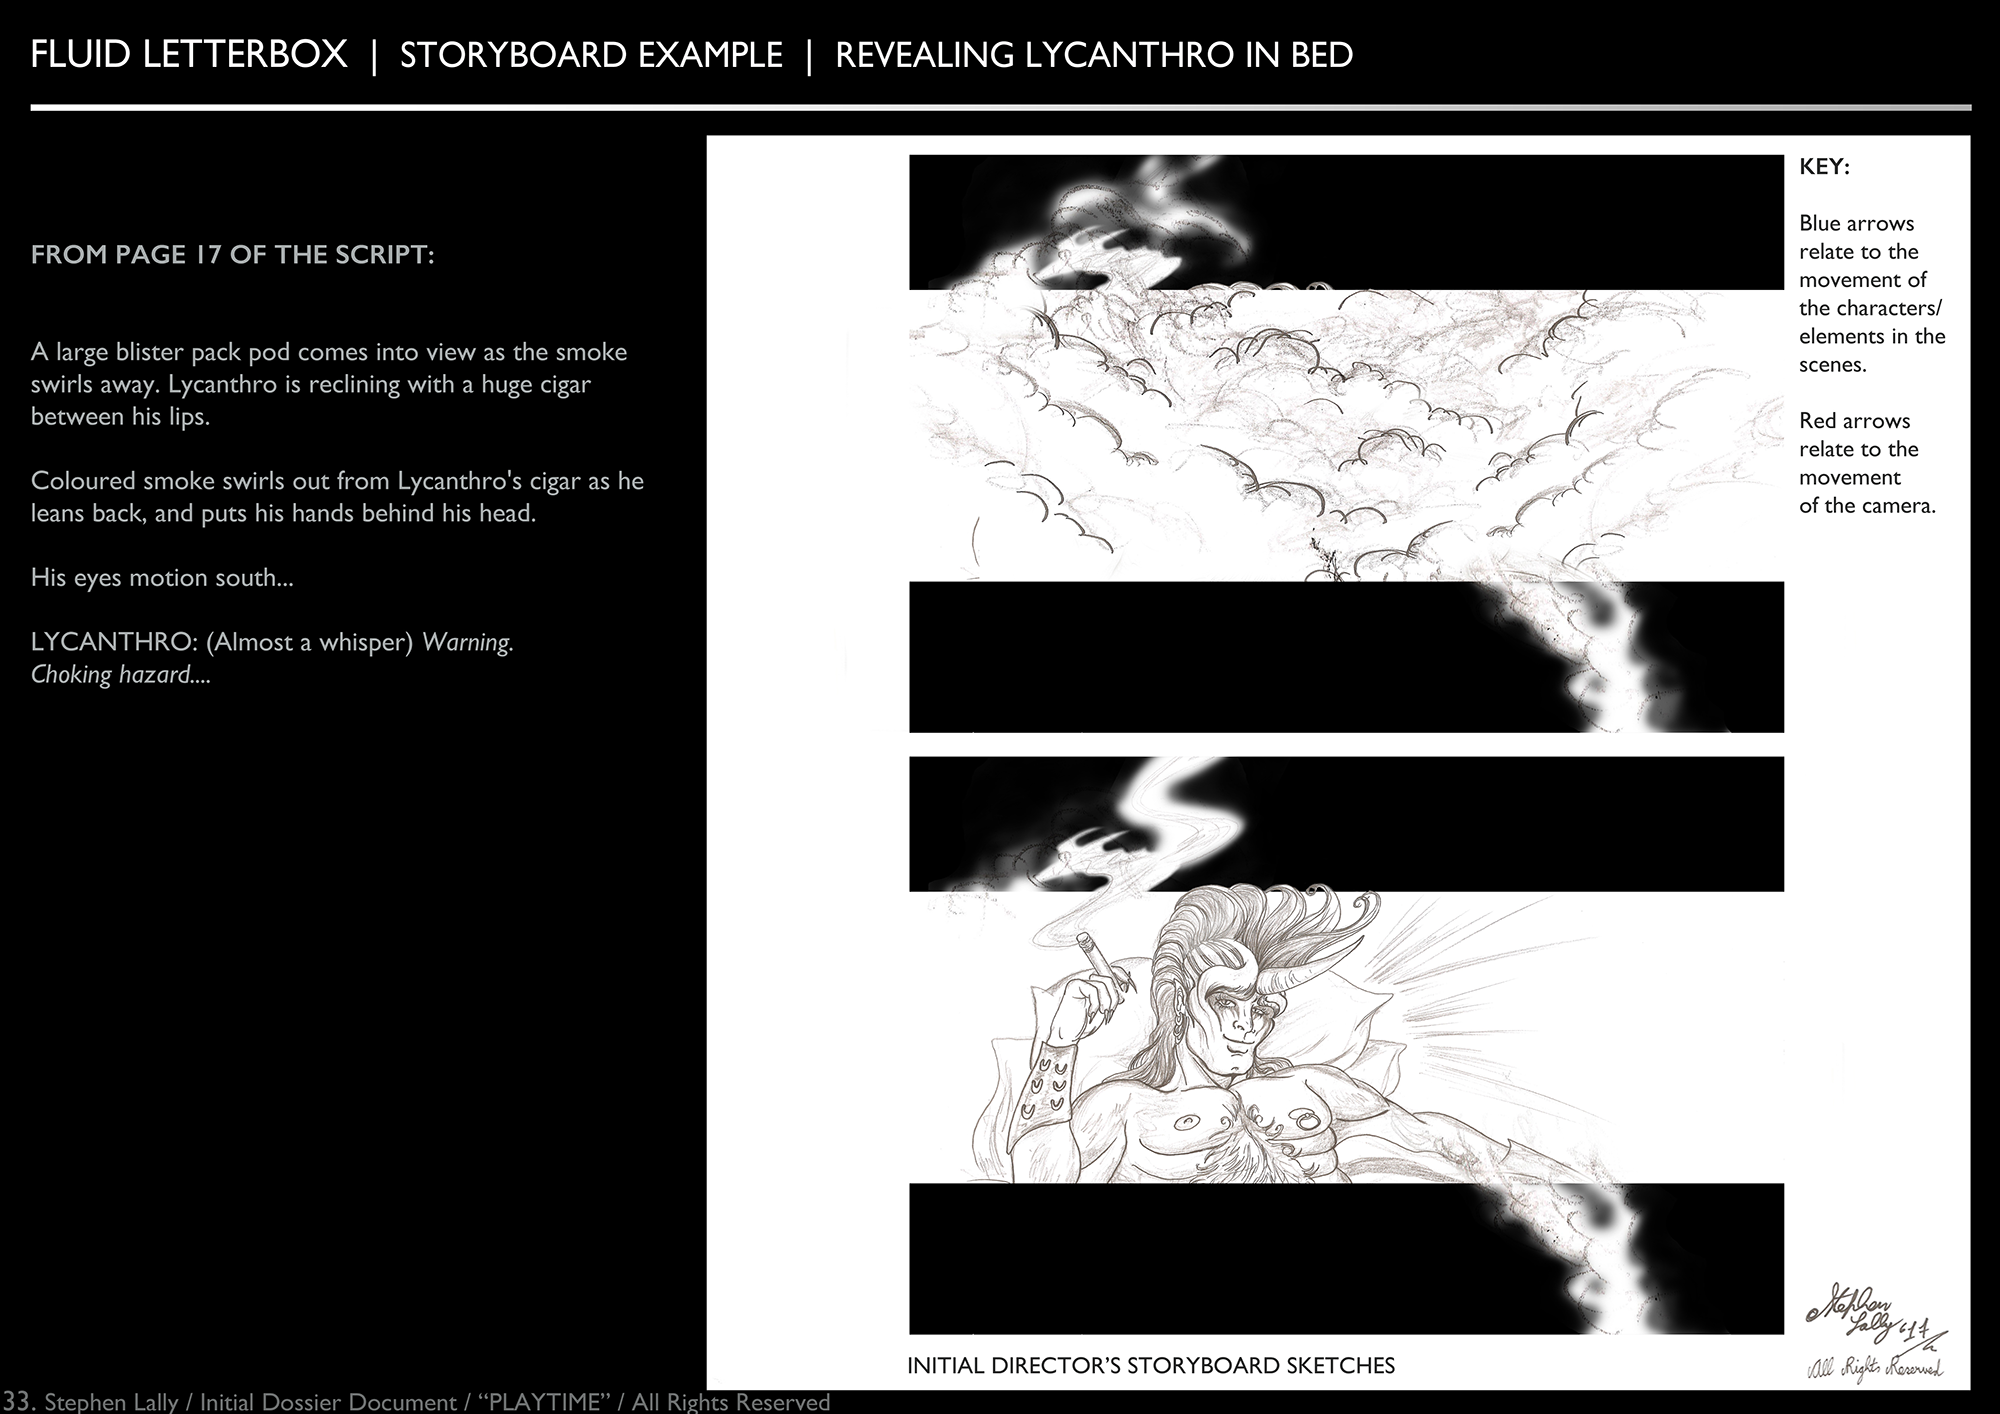 stephen_lally_storyboard_artwork_06.png